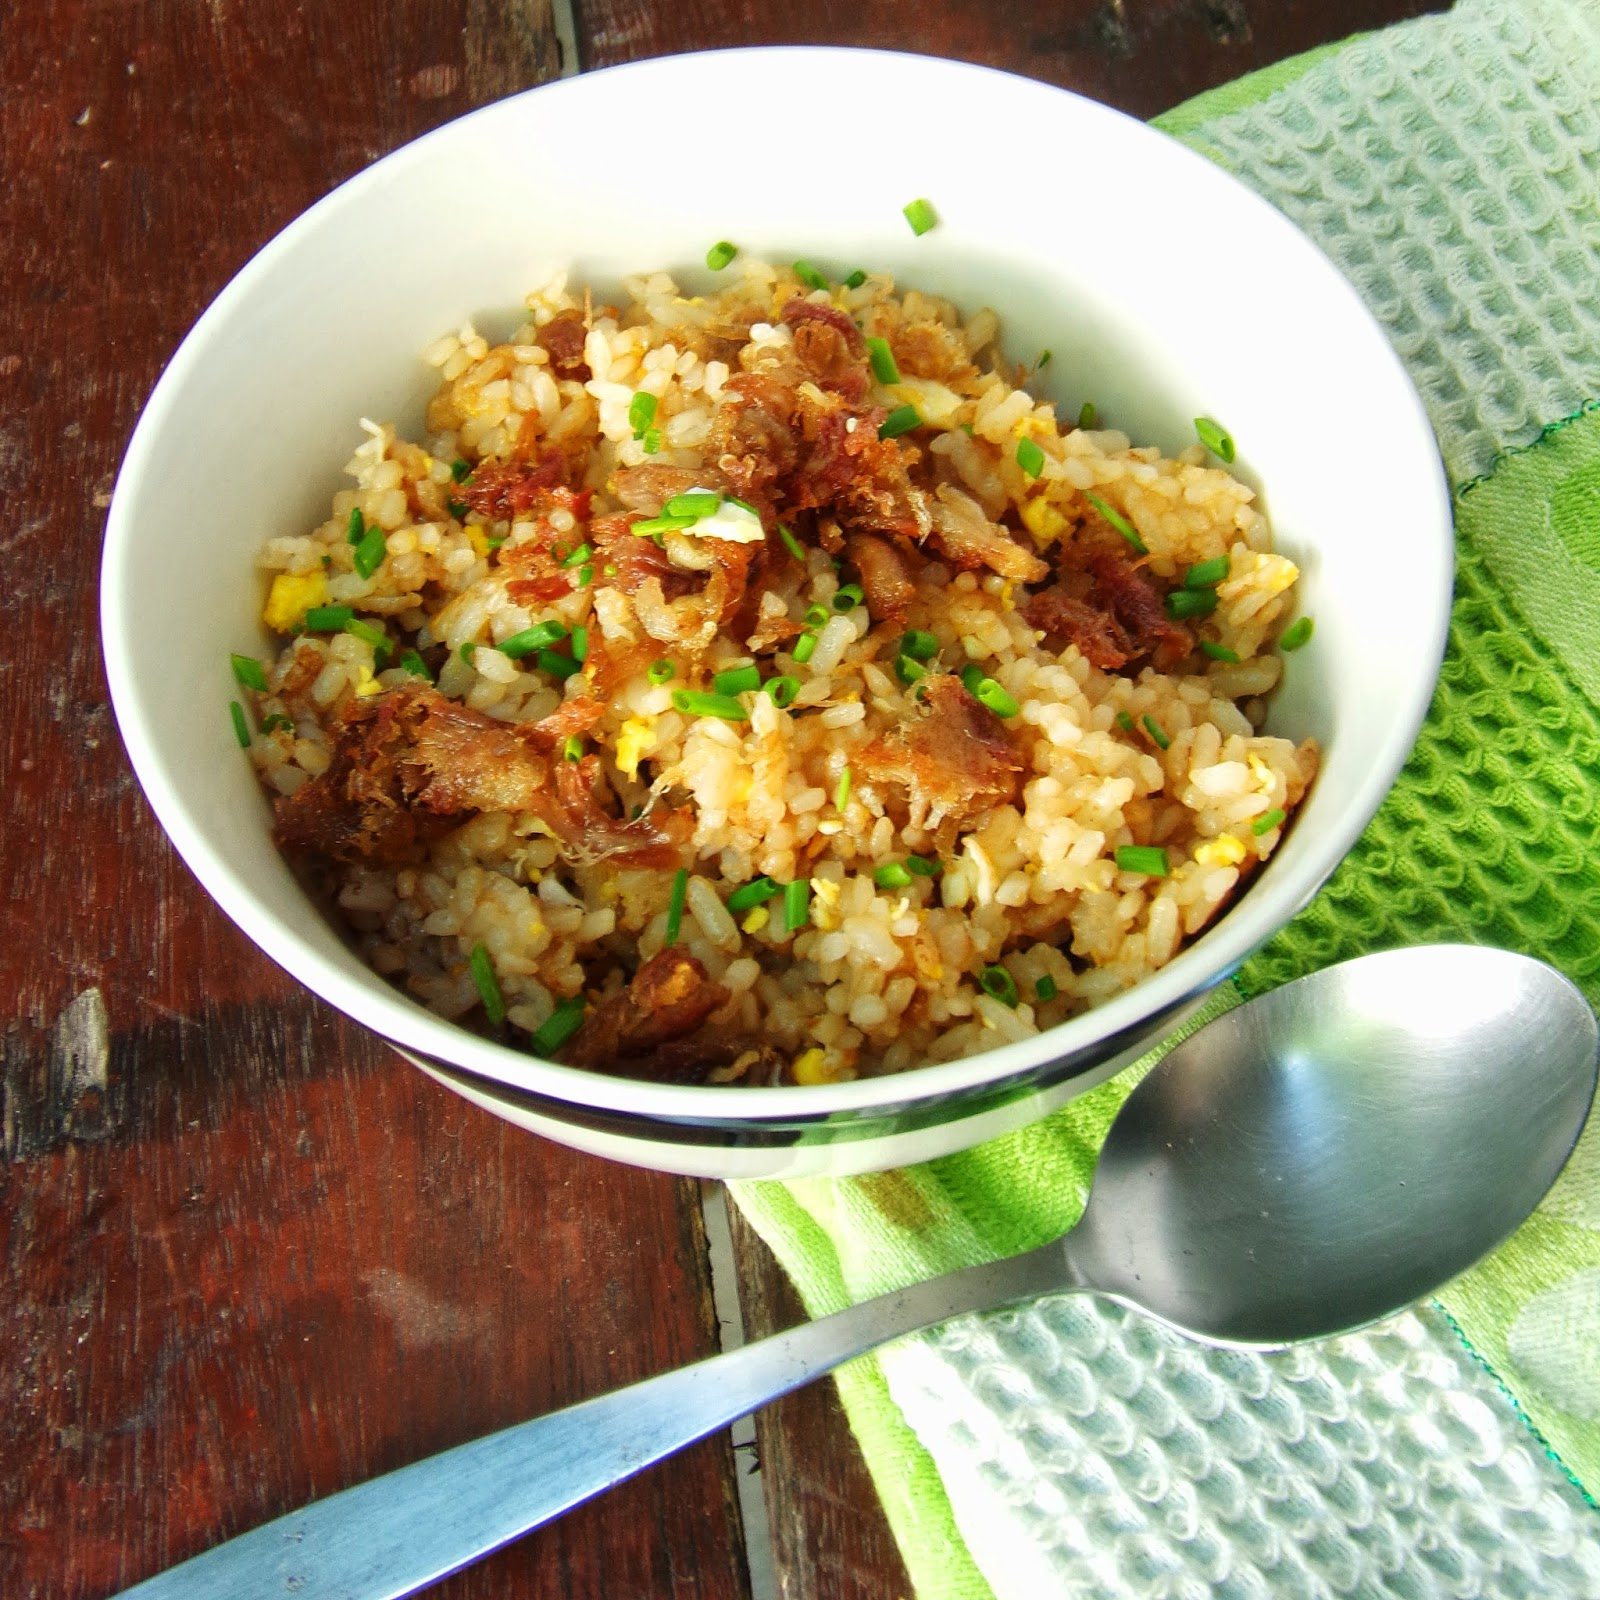 budbud fried rice, budbud rice, budbod fried rice, budbod rice